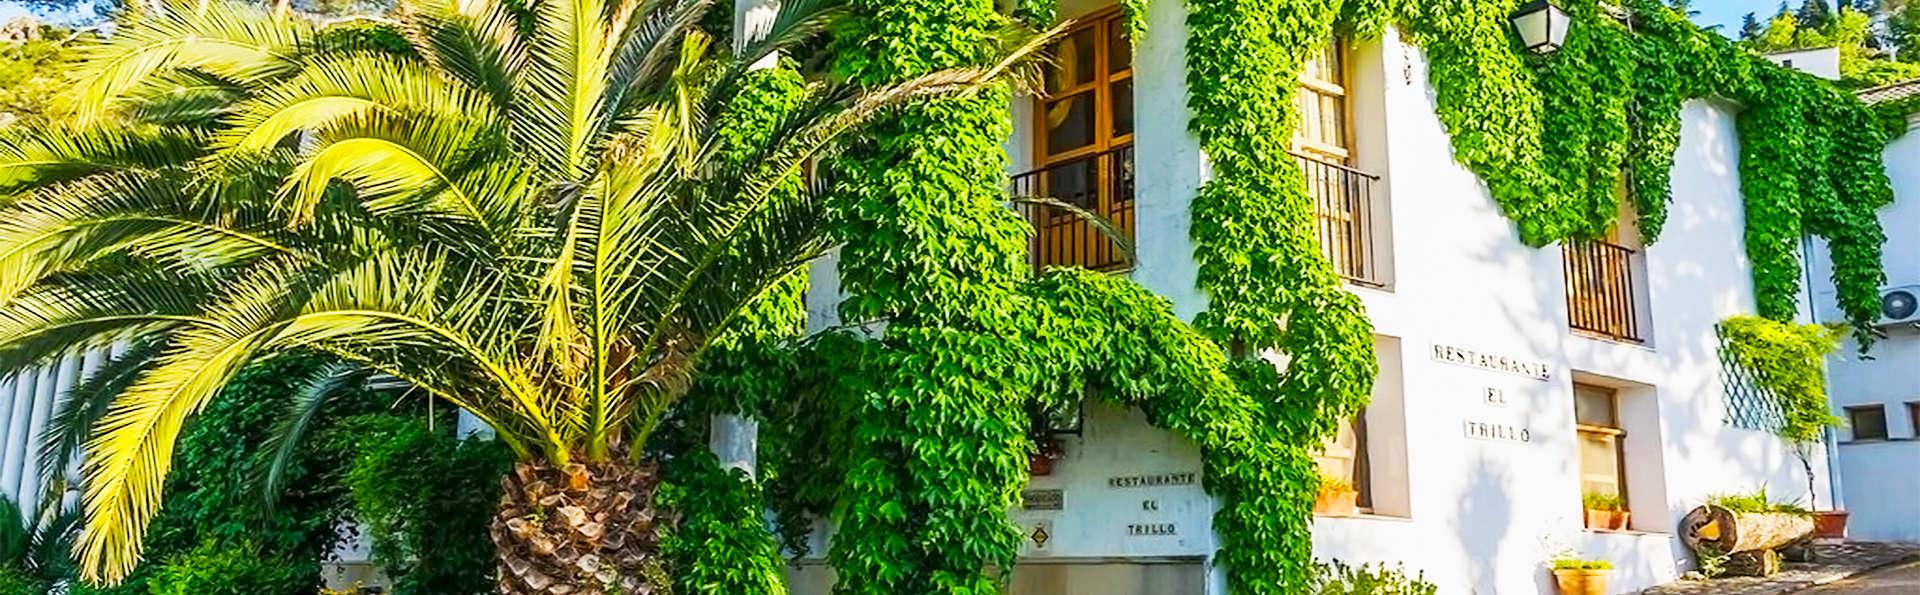 Hotel Villa de Cazorla - EDIT_0_fachada.jpg